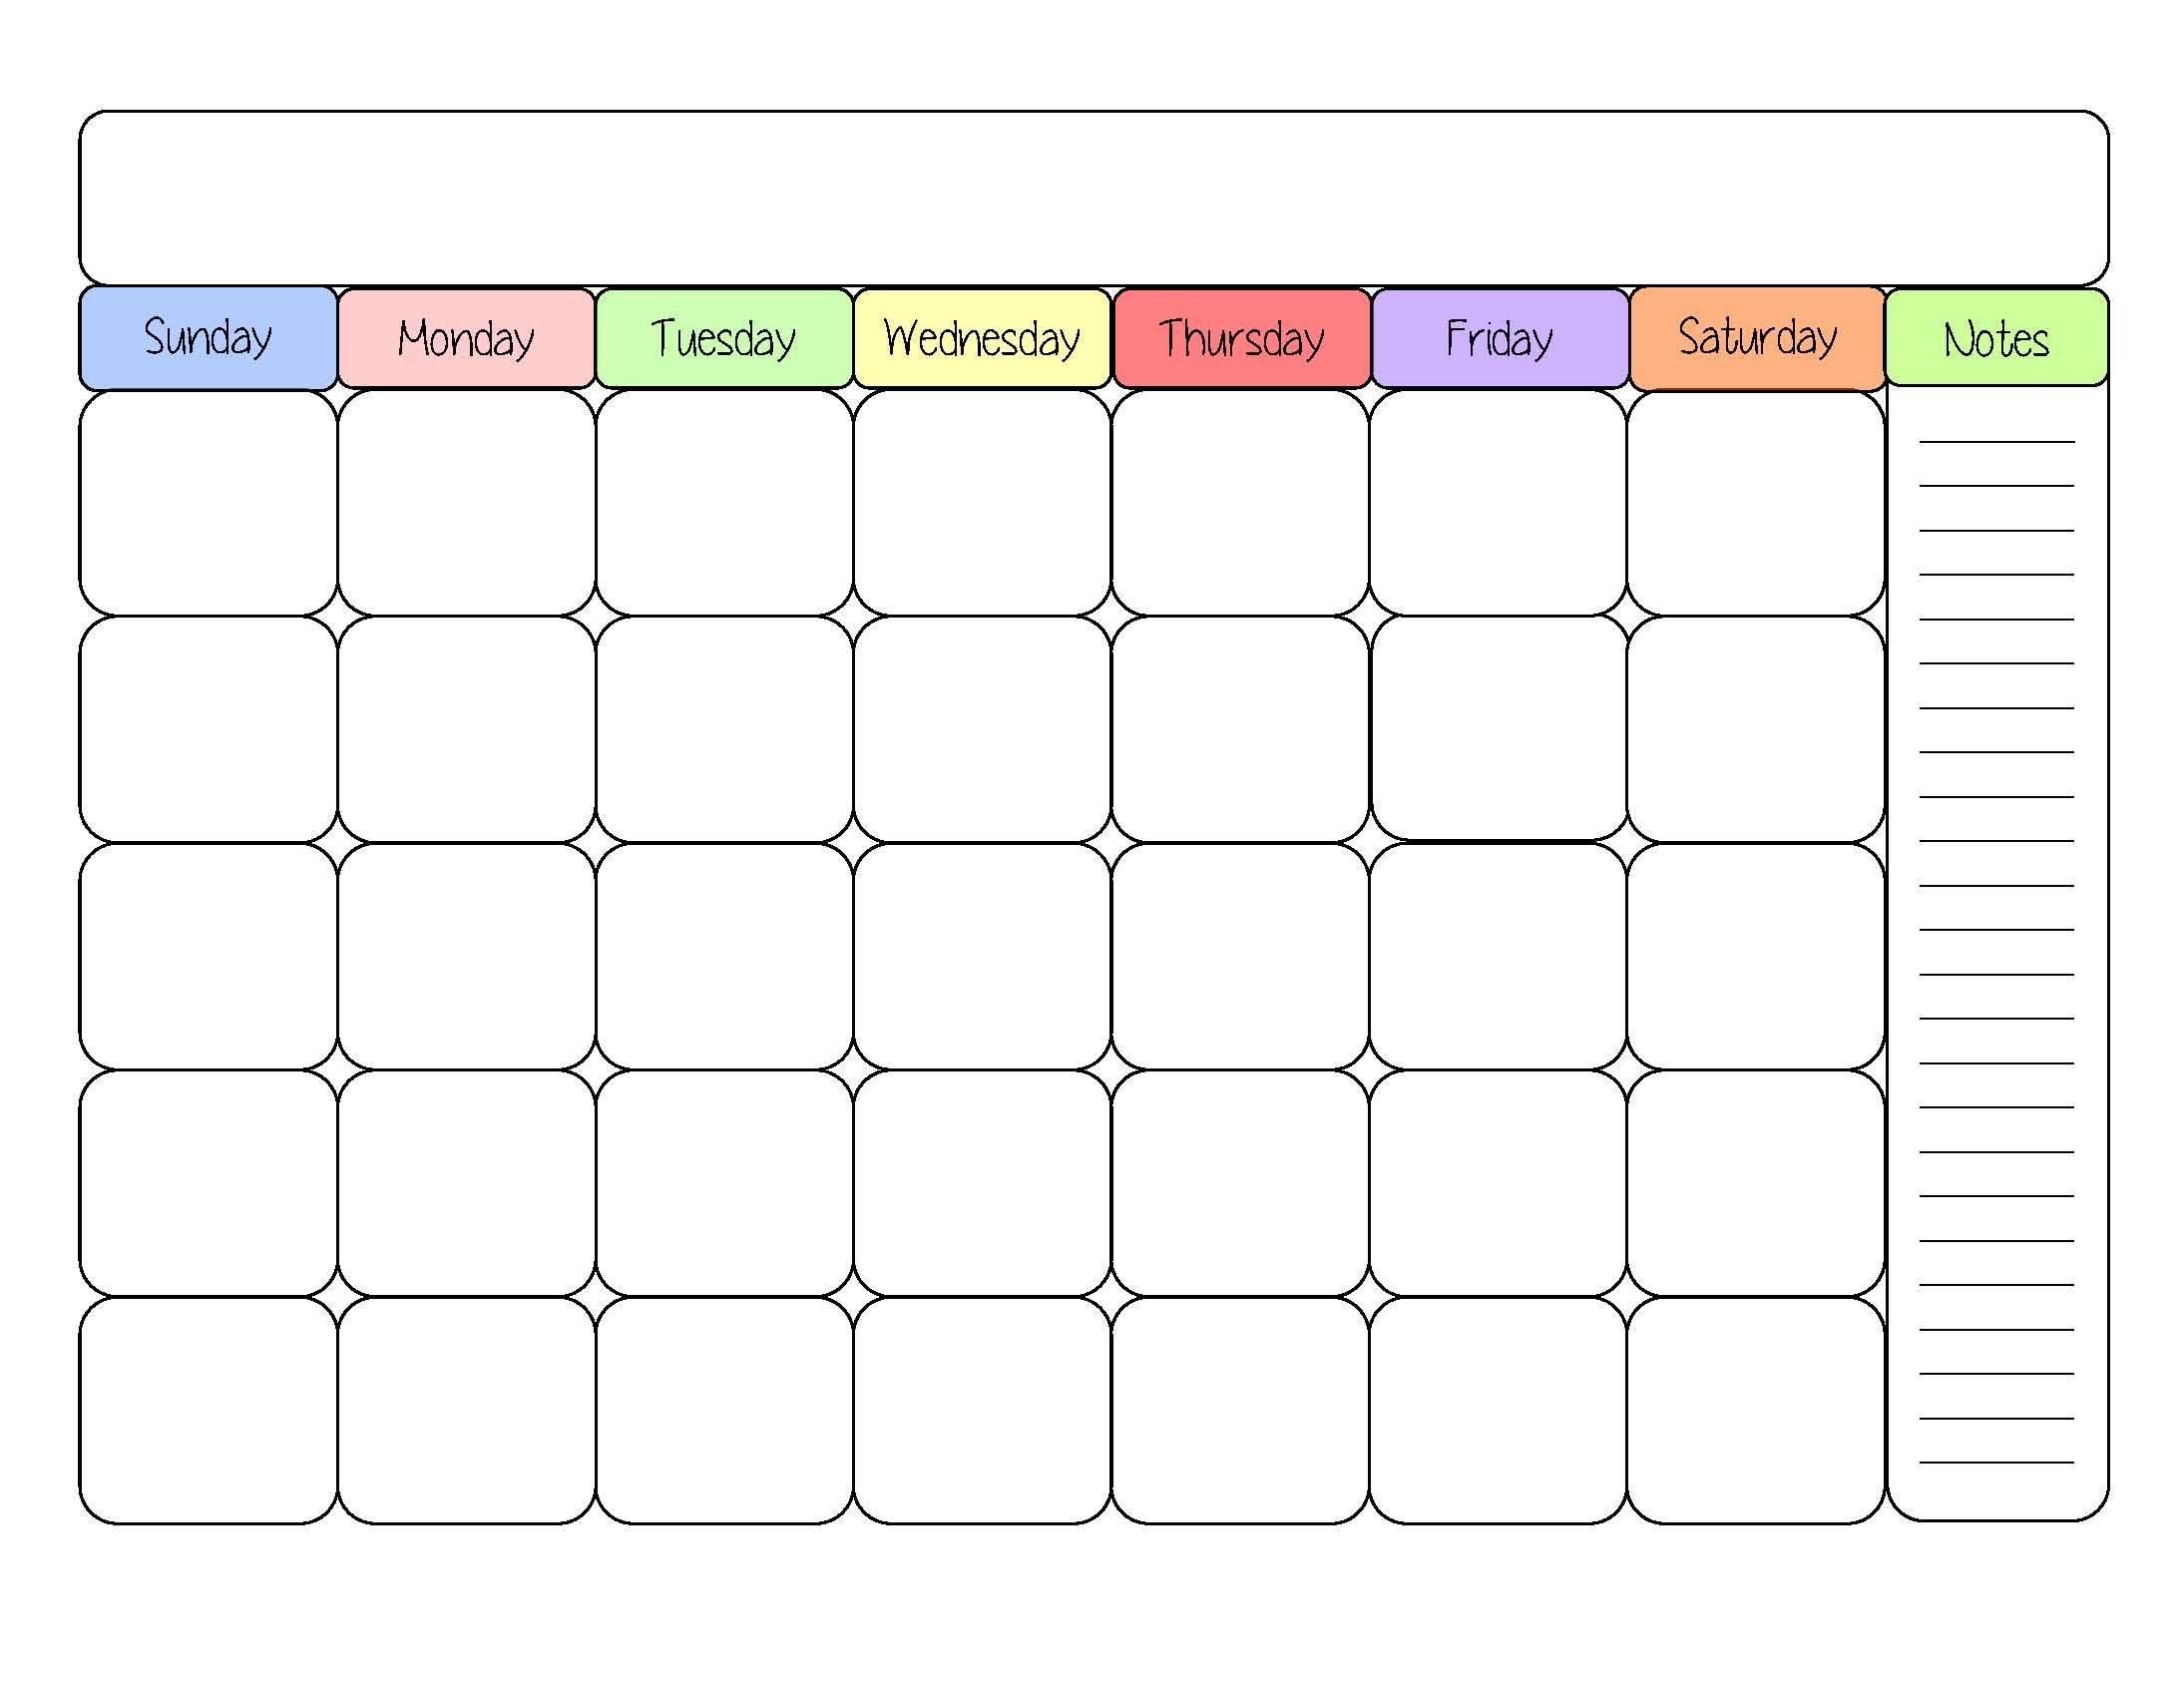 Free Printable Calendar Template Simply Sweet Days  Free Printable Blank Monthly Calendar Templates